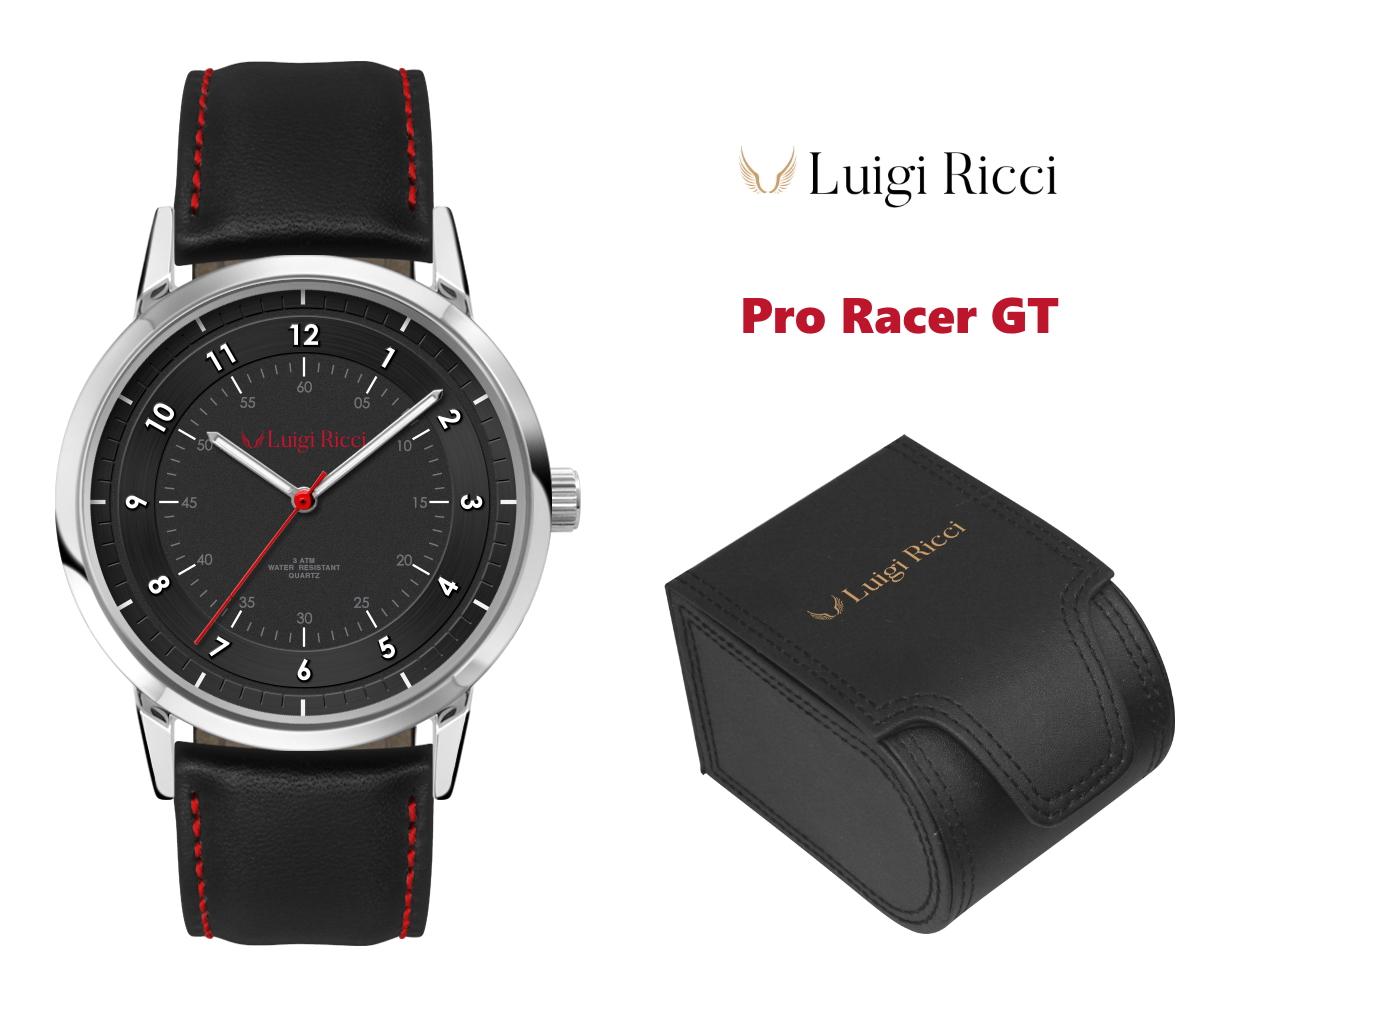 Luigi Ricci Pro Racer GT